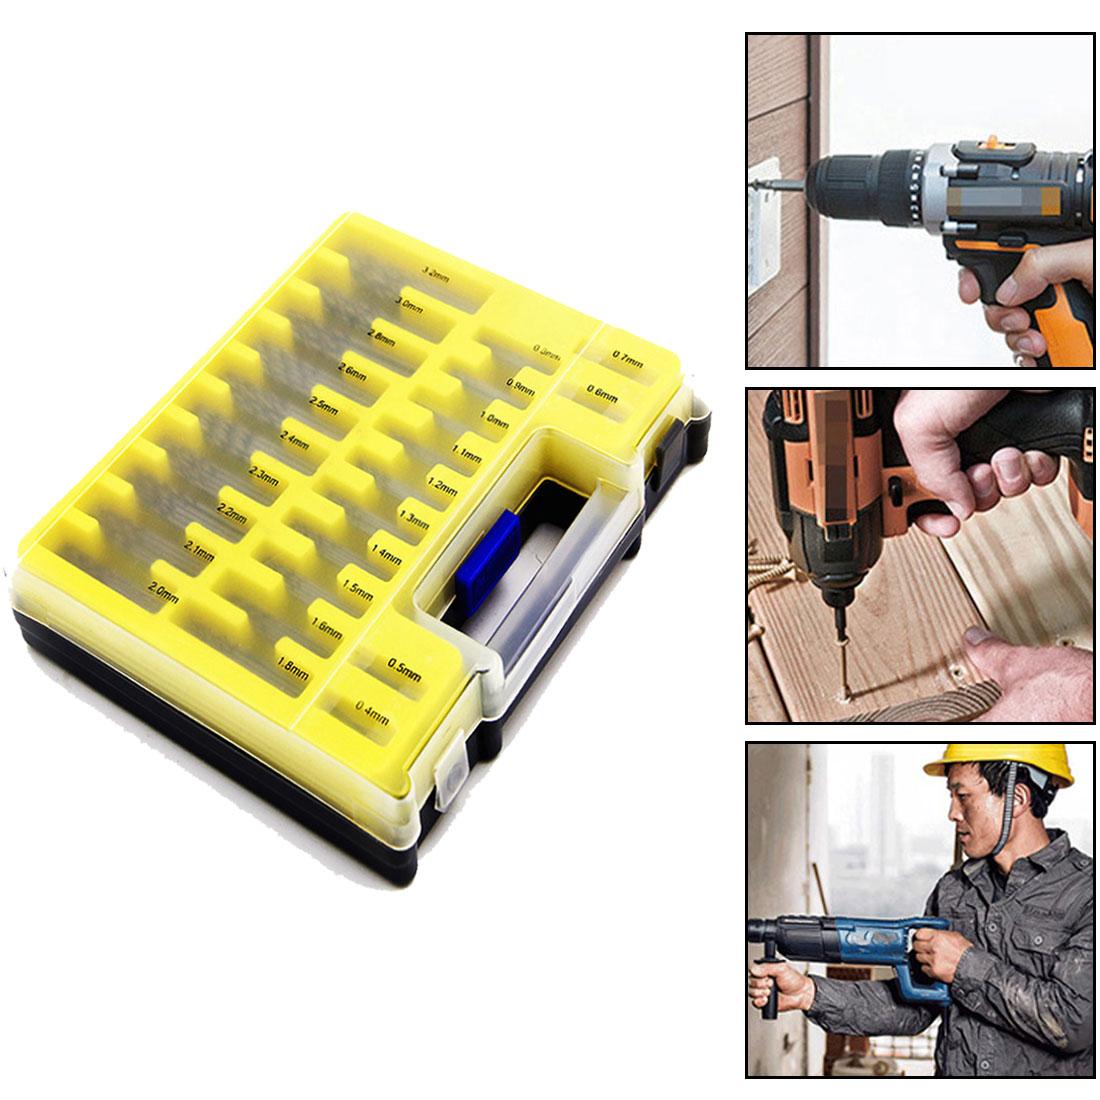 tasp 150pc hss micro pcb drill bit set precision twist drilling kit with storage box 150PCS Hand Tools Twist Drill 0.4-3.2mm Drill Bit Set  Kit Tool Drill Bit  Small Precision with Carry Case Plastic Box Mini HSS